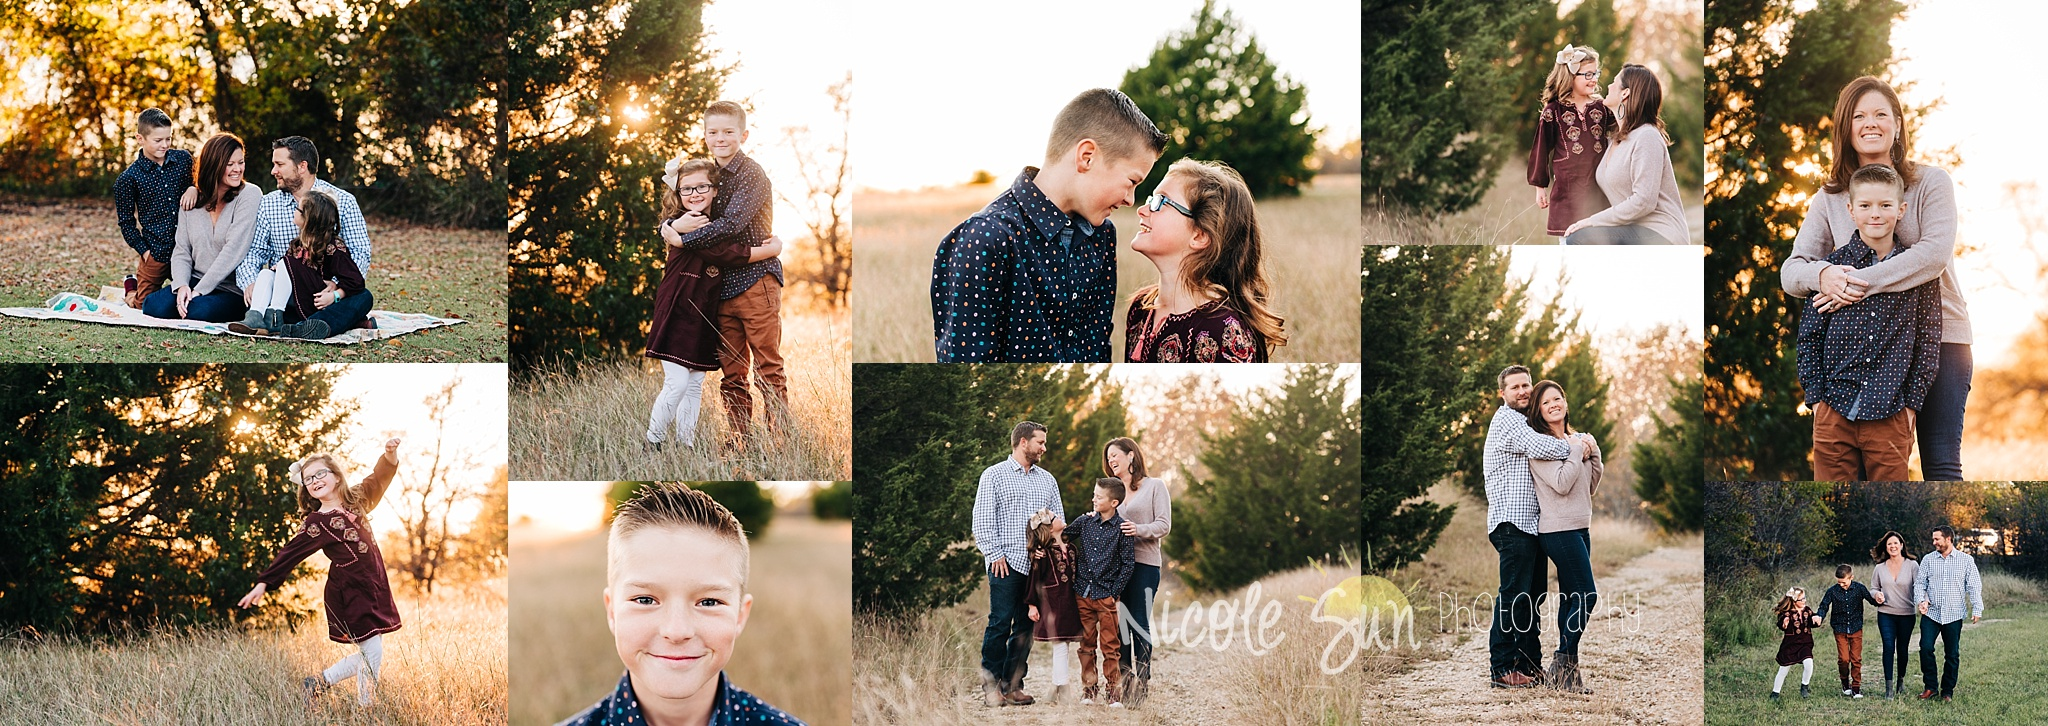 littleelmfamilyphotography.jpg